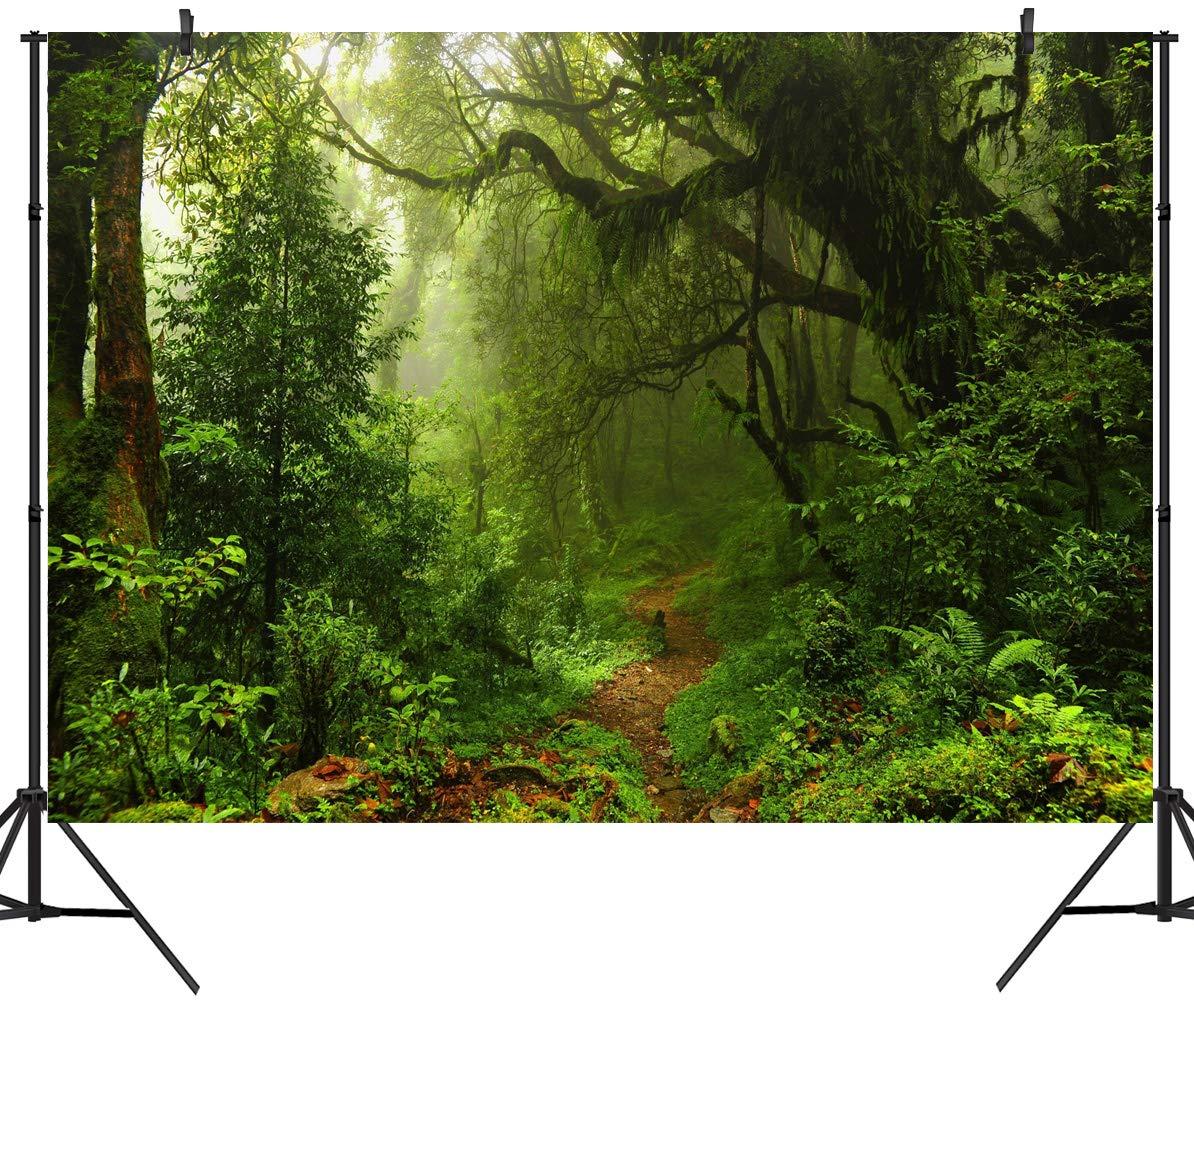 Duluda 10X8FT Seamless Jungle Forest Vinyl Photography Backdrop Customized Photo Background Studio Prop TG04E